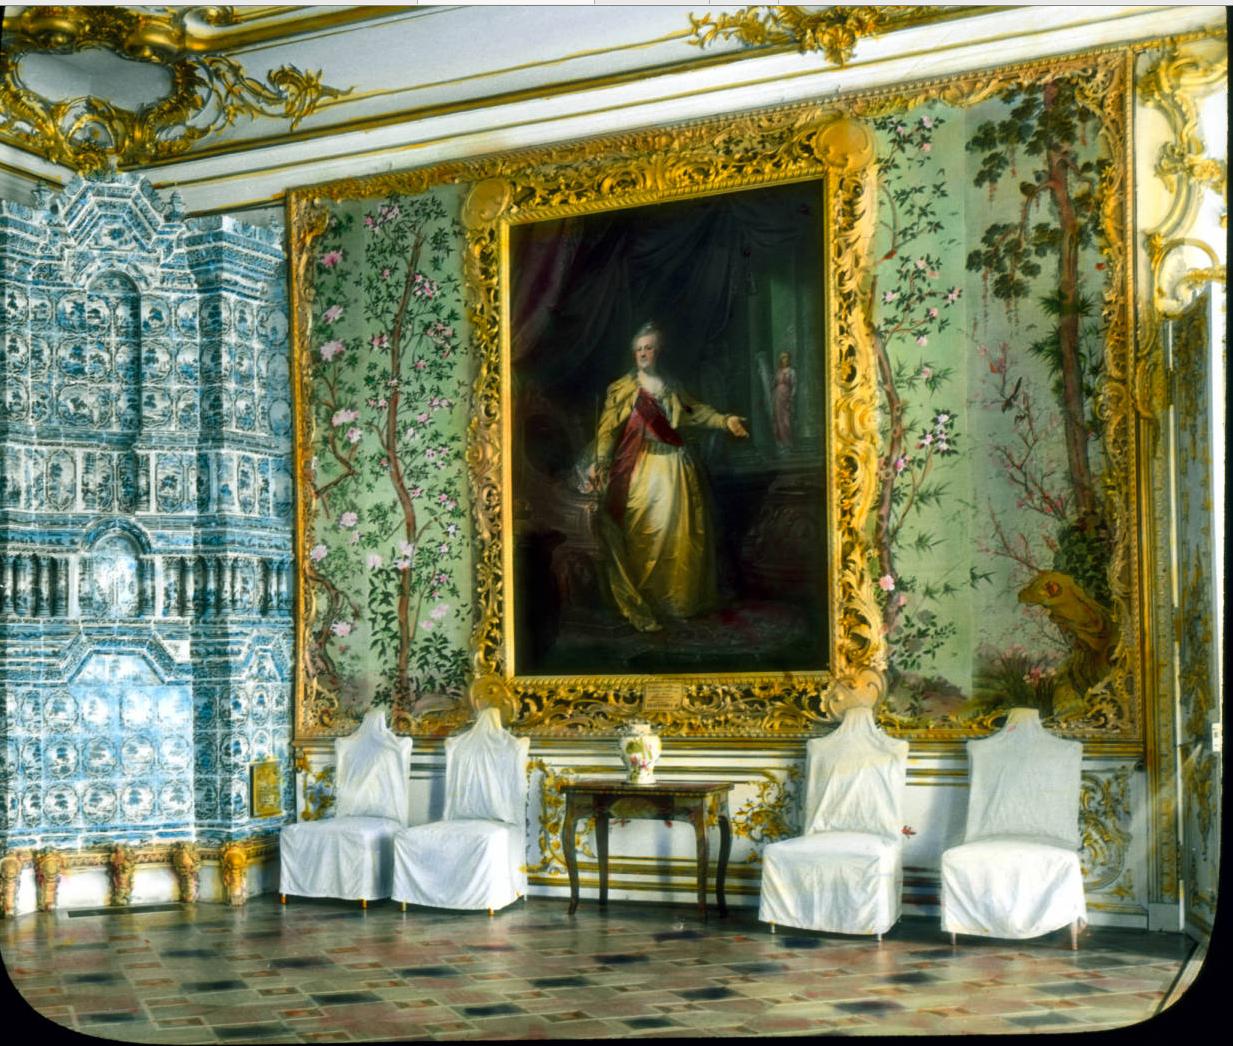 Пушкин (Царское Село). Интерьер Екатерининского дворца